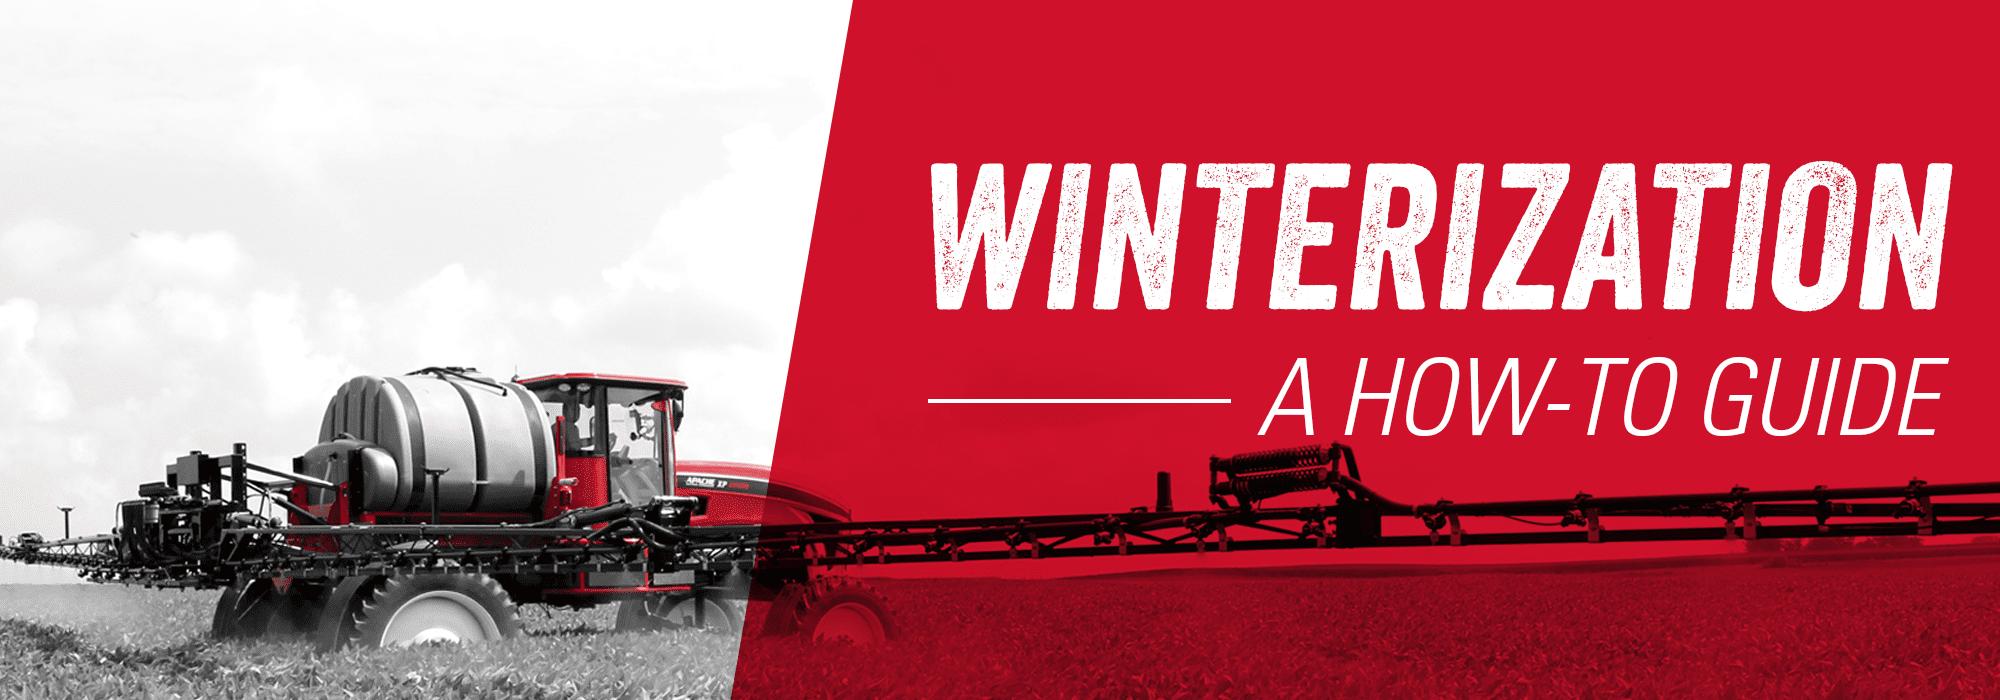 Apache Sprayers Winterization A How-To Guide Header